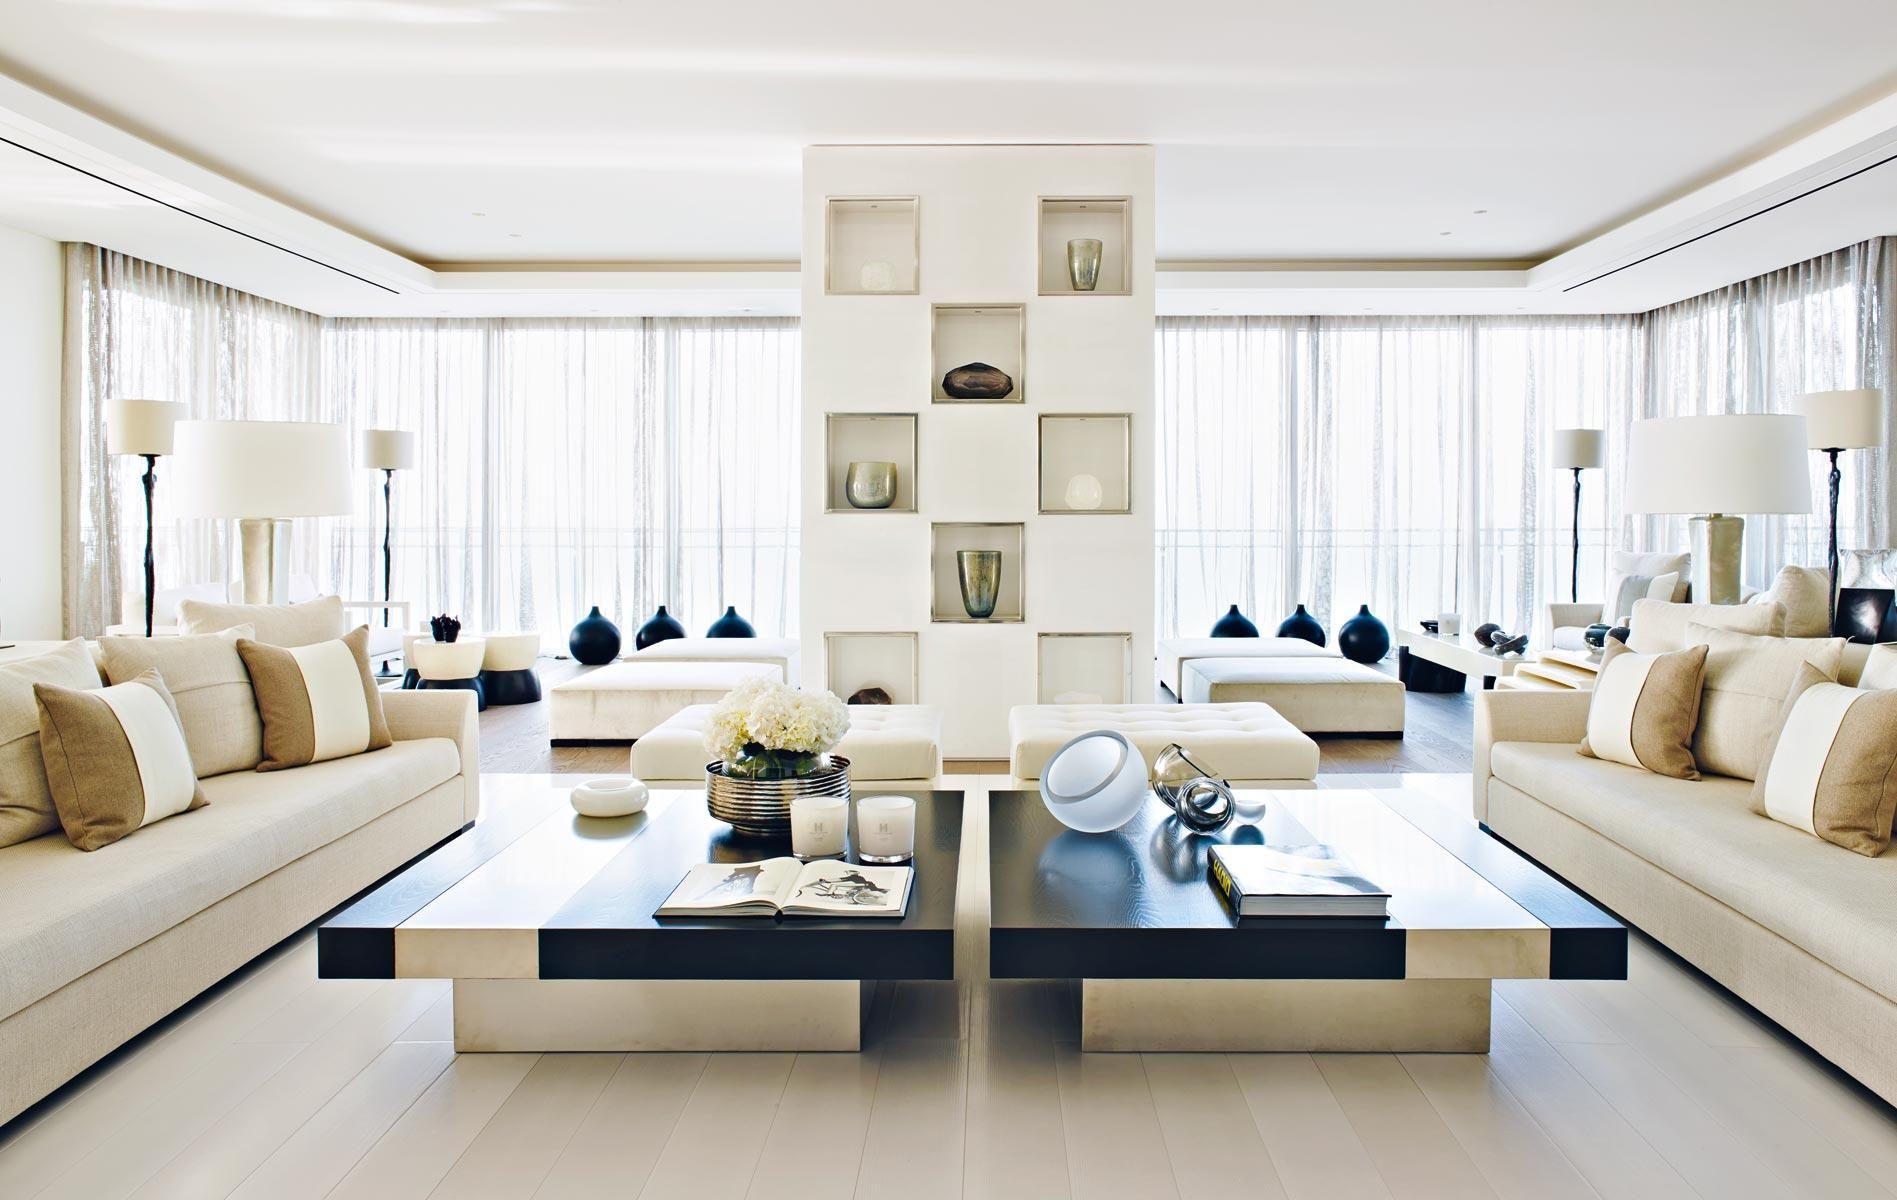 40 Asymmetrical Balance Interior Design Wall Art Inspired By